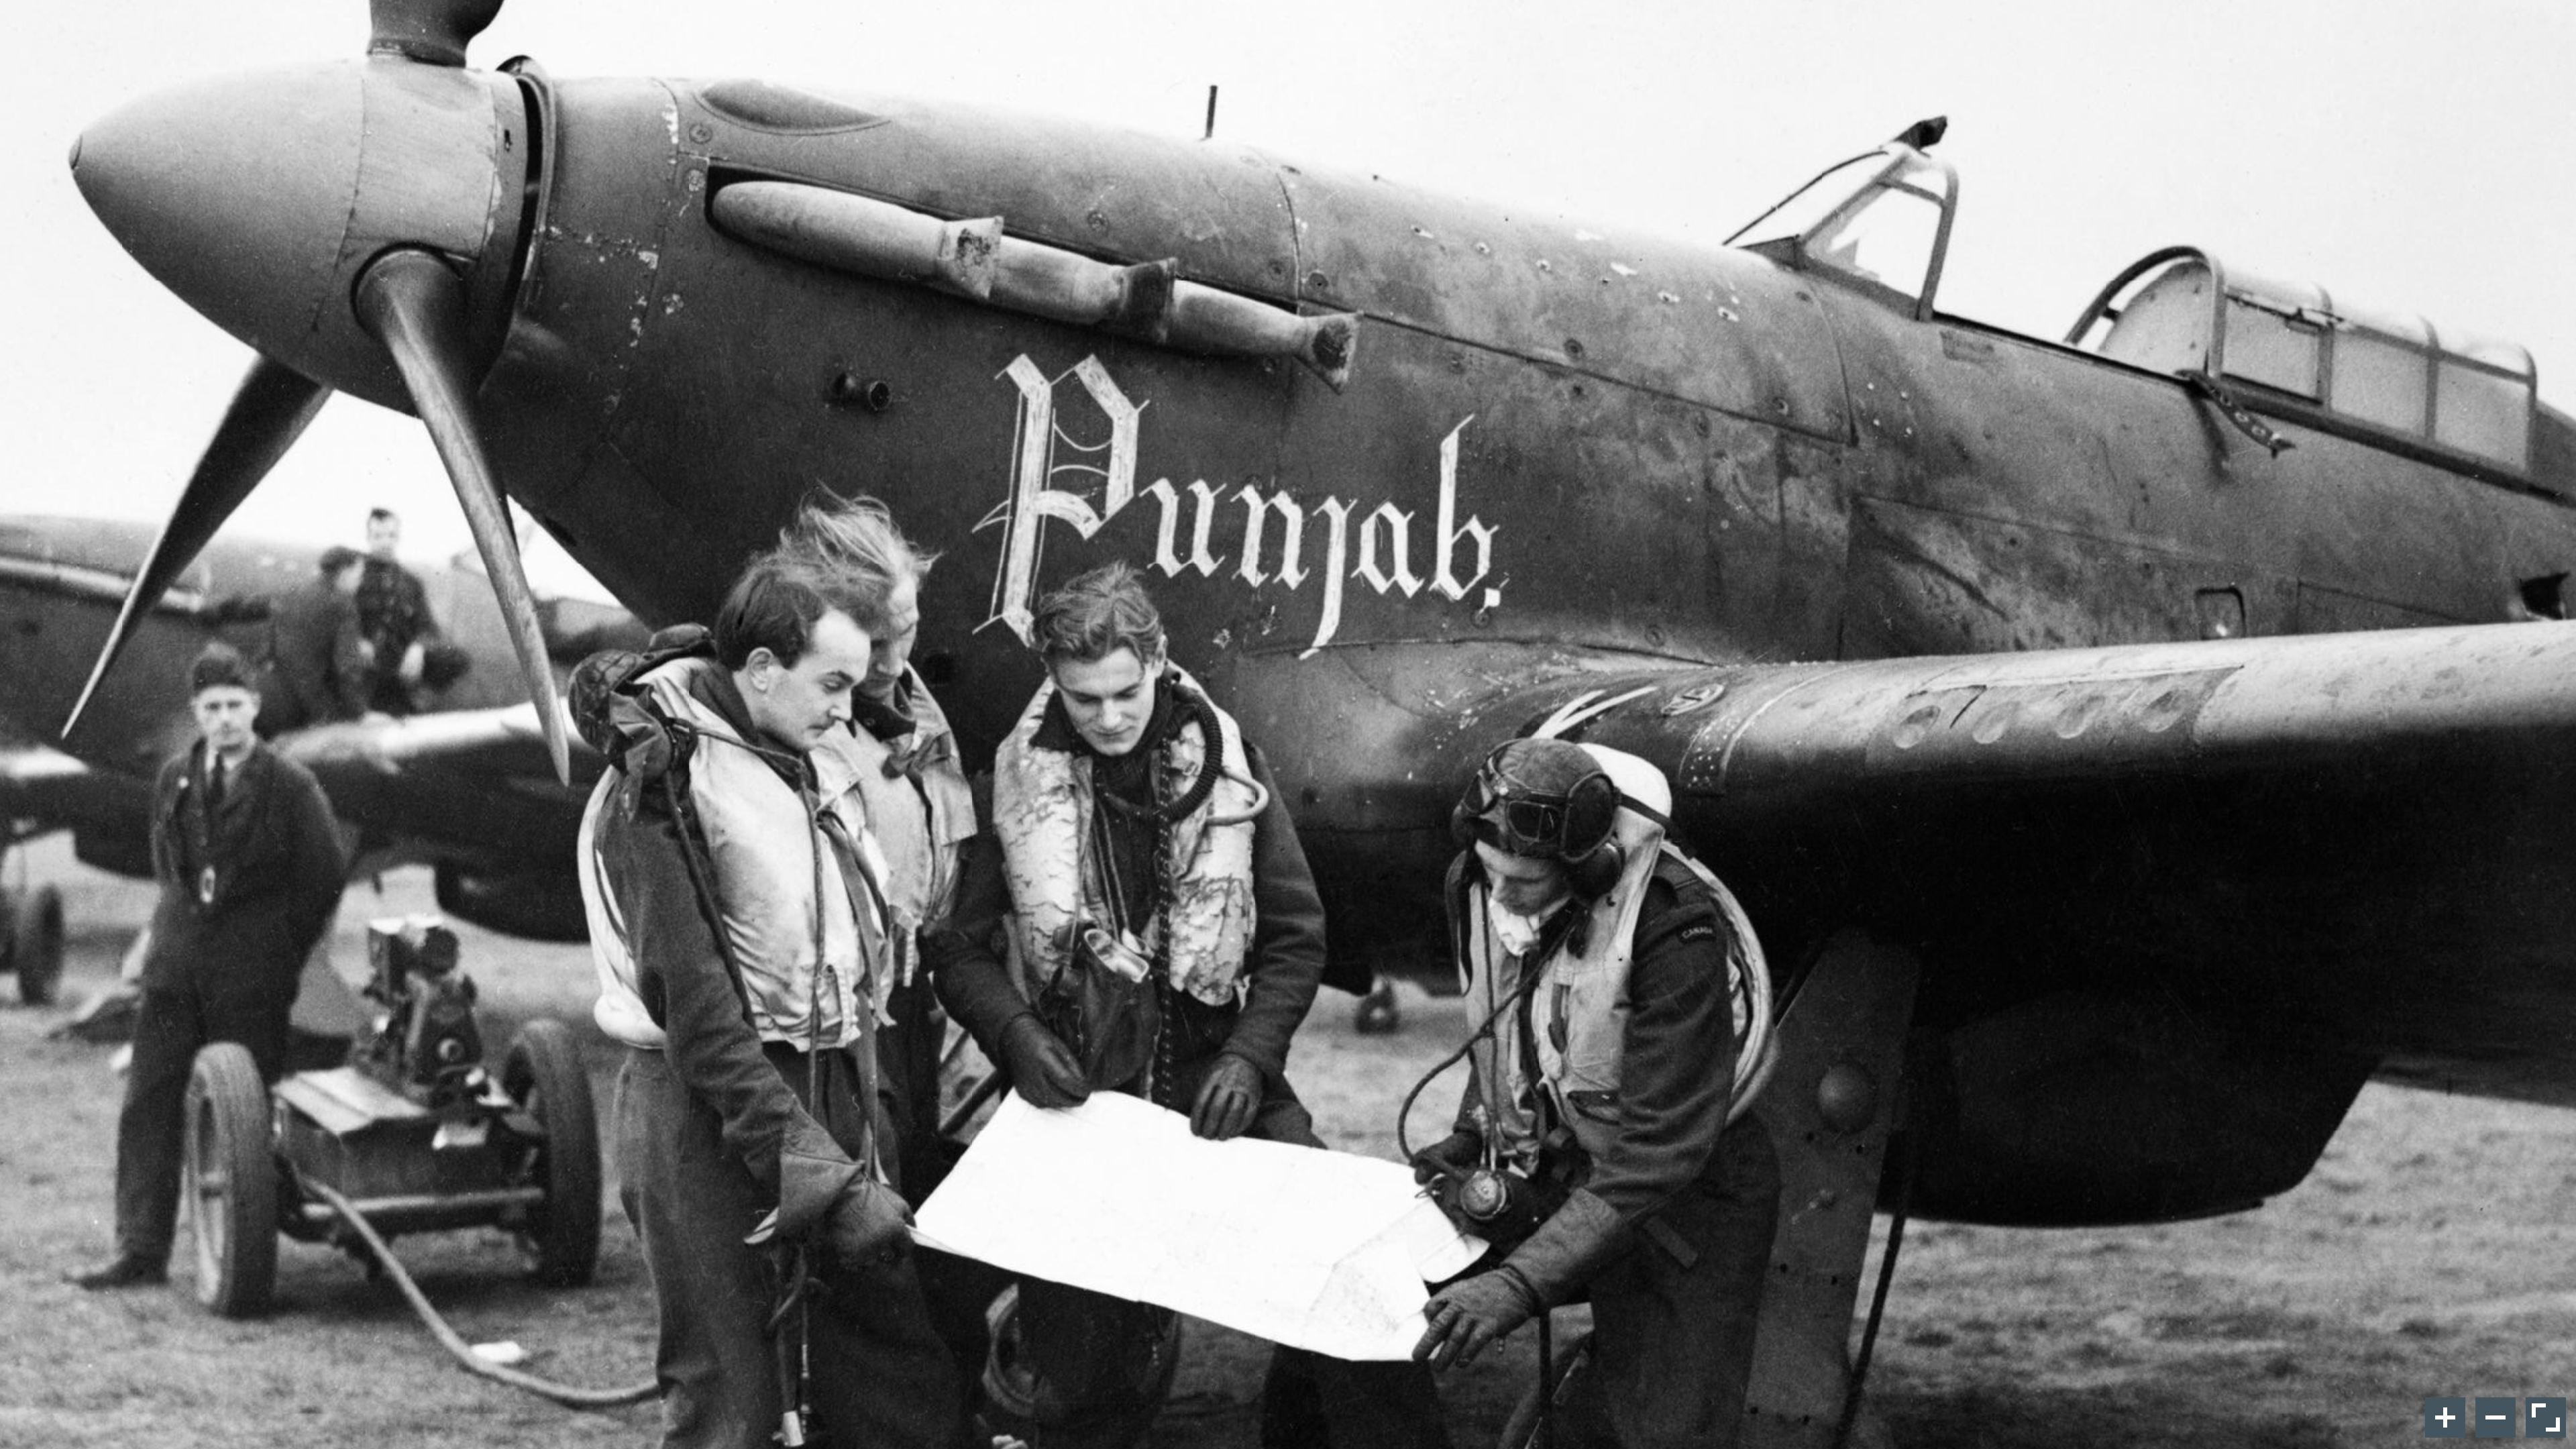 Hurricane I RAF 56Sqn USV Punjab at Duxford 2 Jan 1942 IWM CH4547a